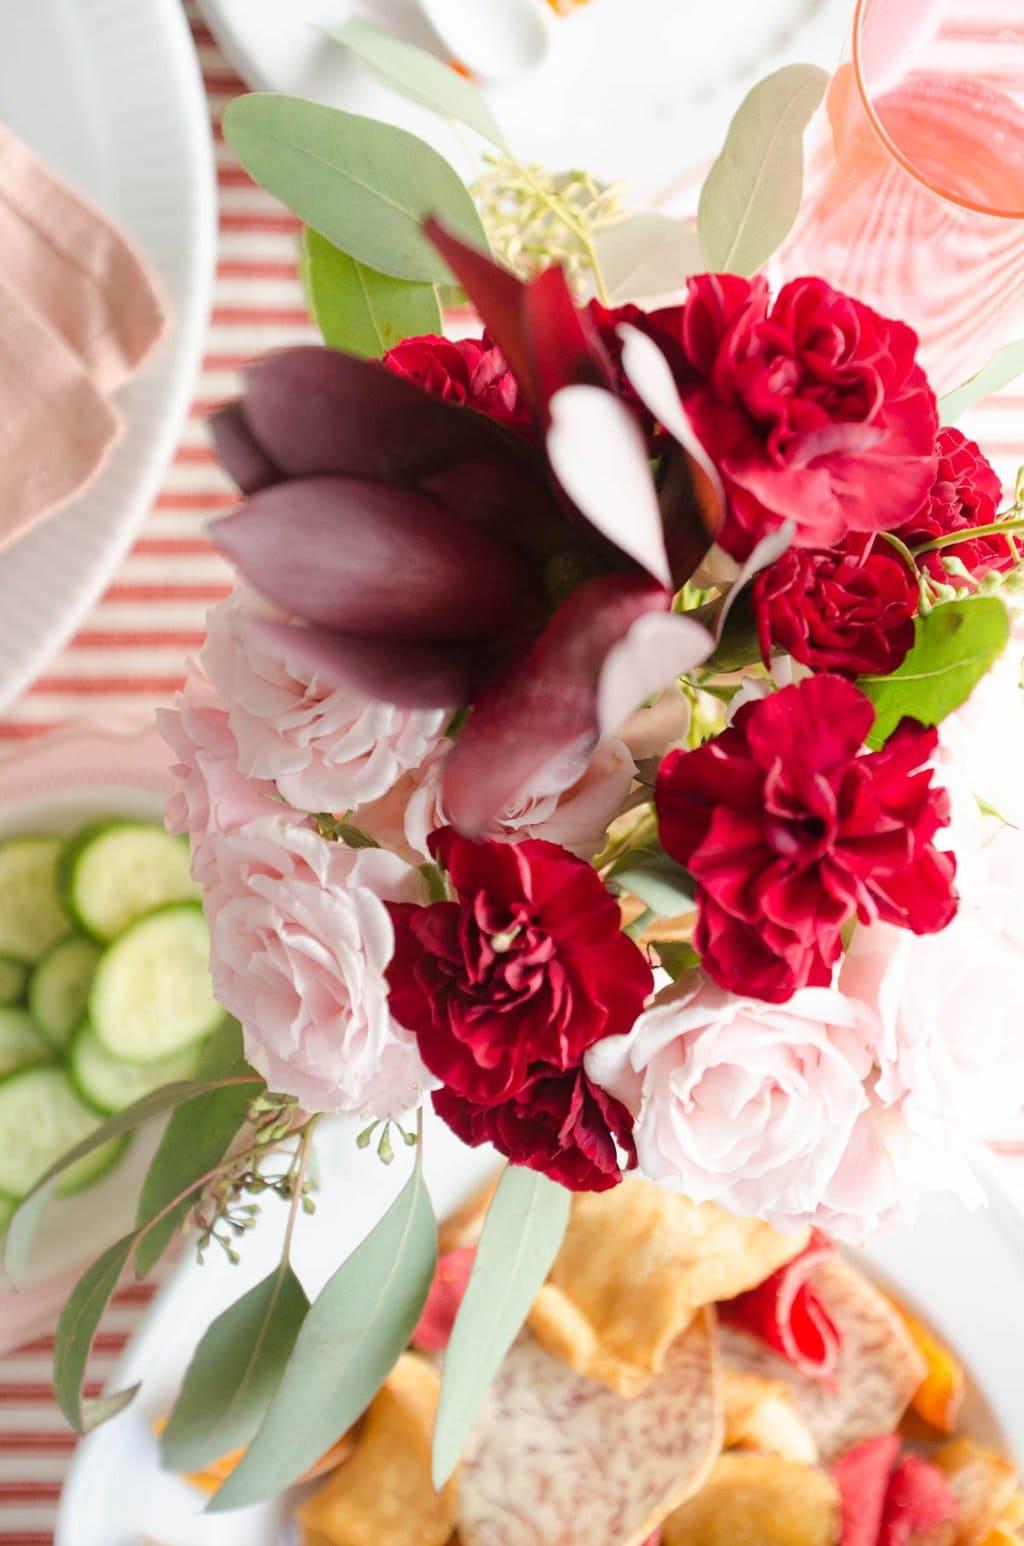 Valentine's Day flower arrangement via @thouswellblog